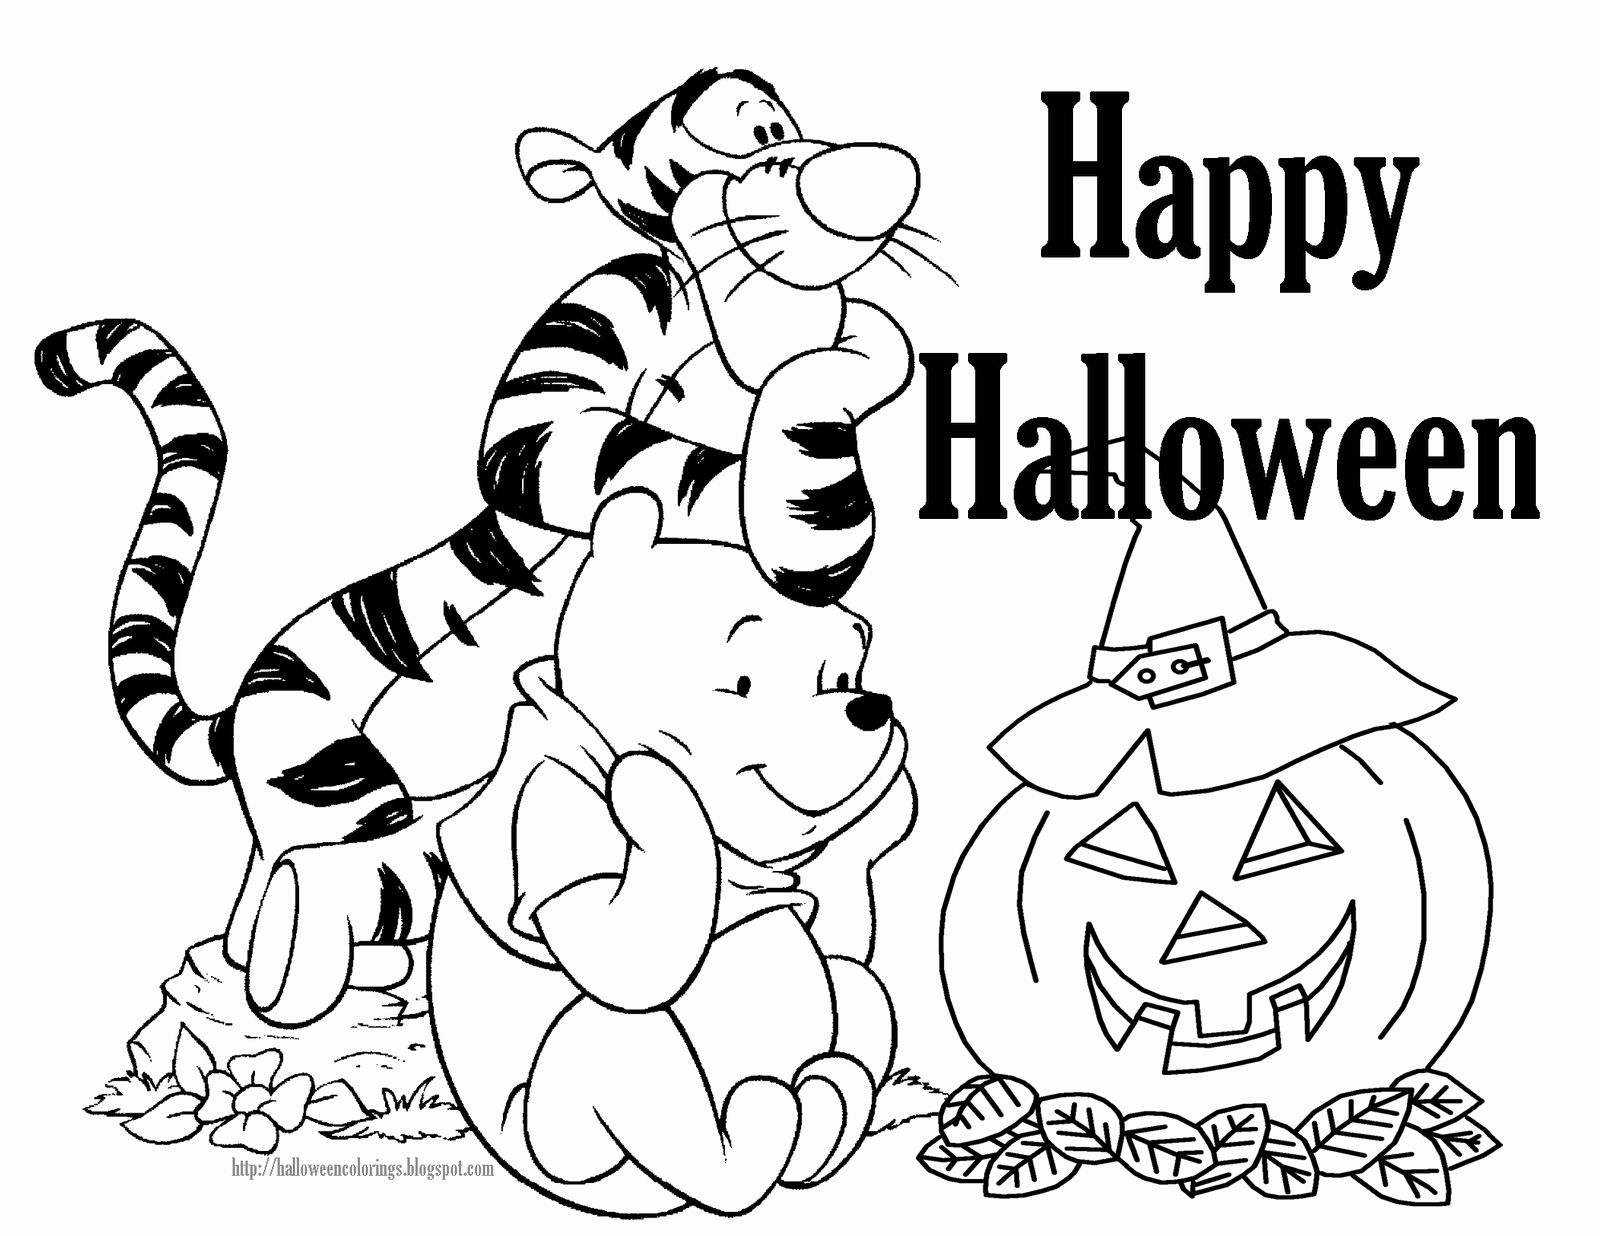 Halloween Coloring Sheets For Adults Dragon Coloring Blog Disney Halloween Gratis Kleurplaten Kleurboek